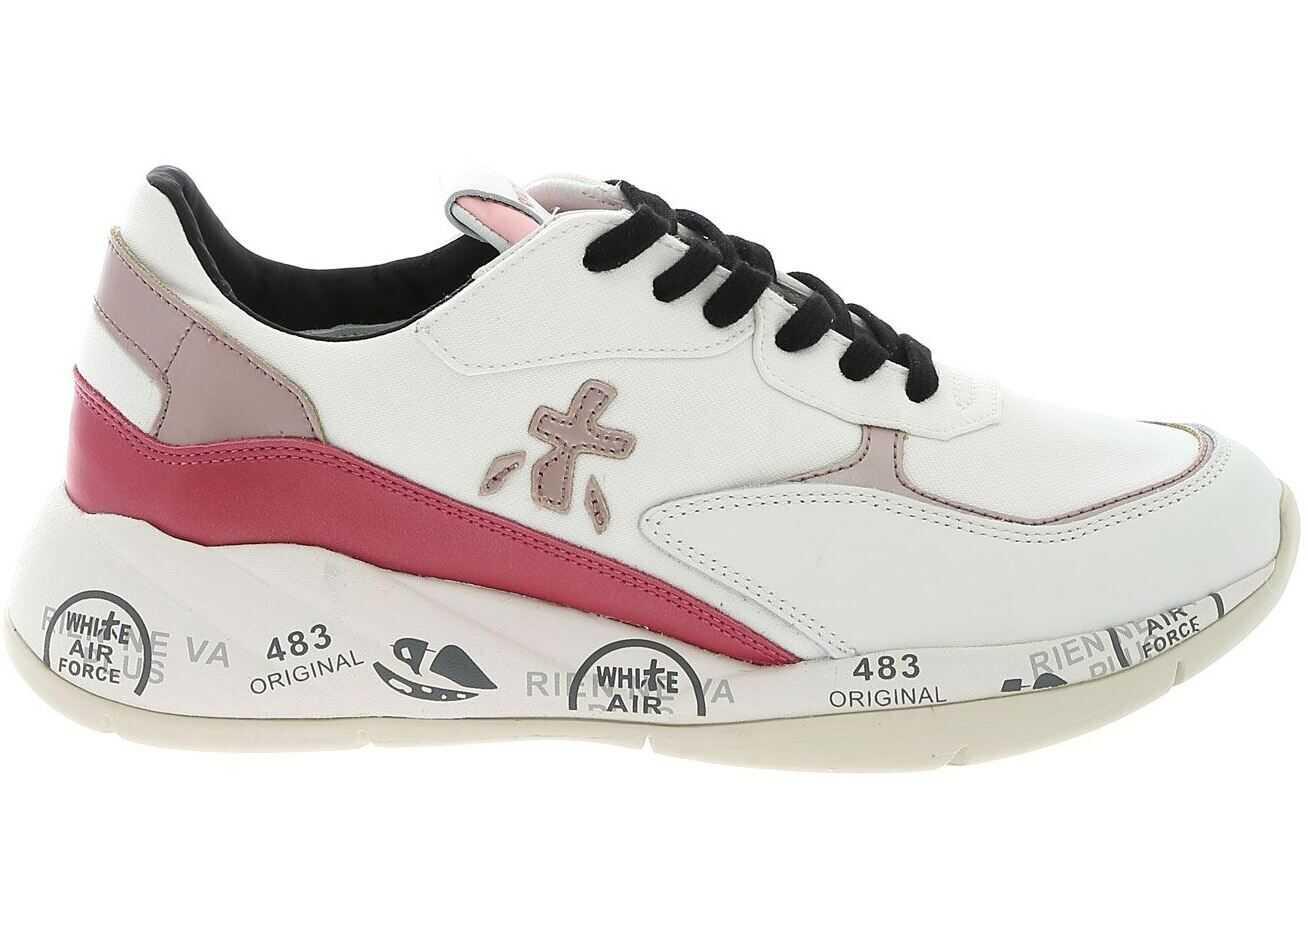 Premiata Scarlett Sneakers In White And Pink White